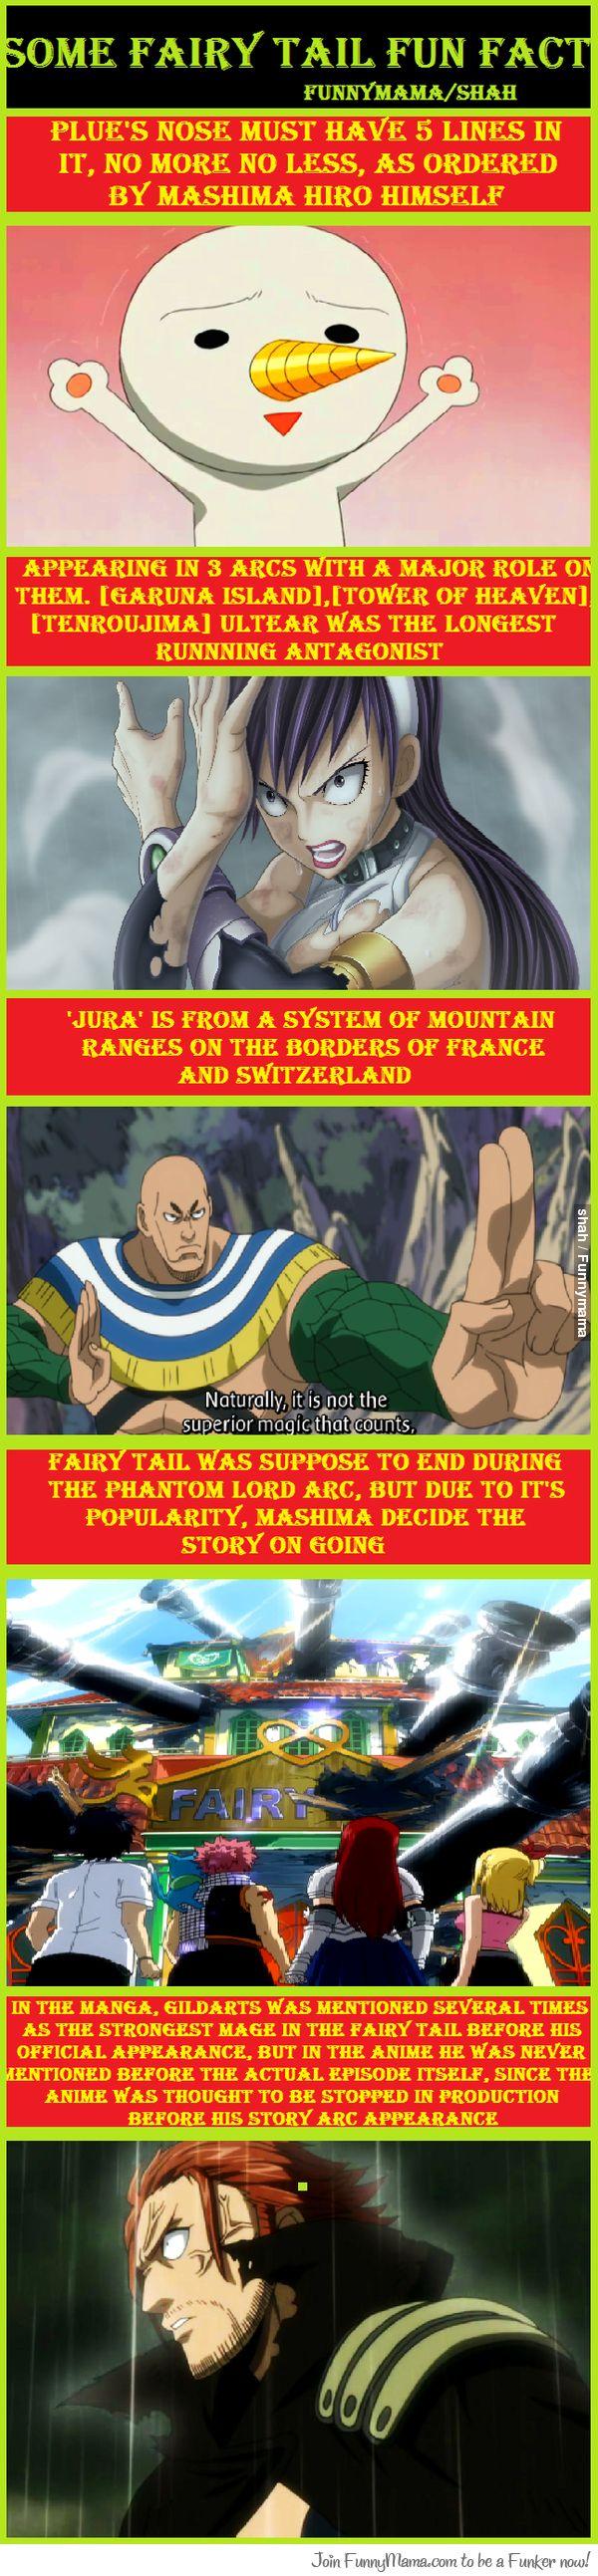 Some Fairy Tail Fun Fact